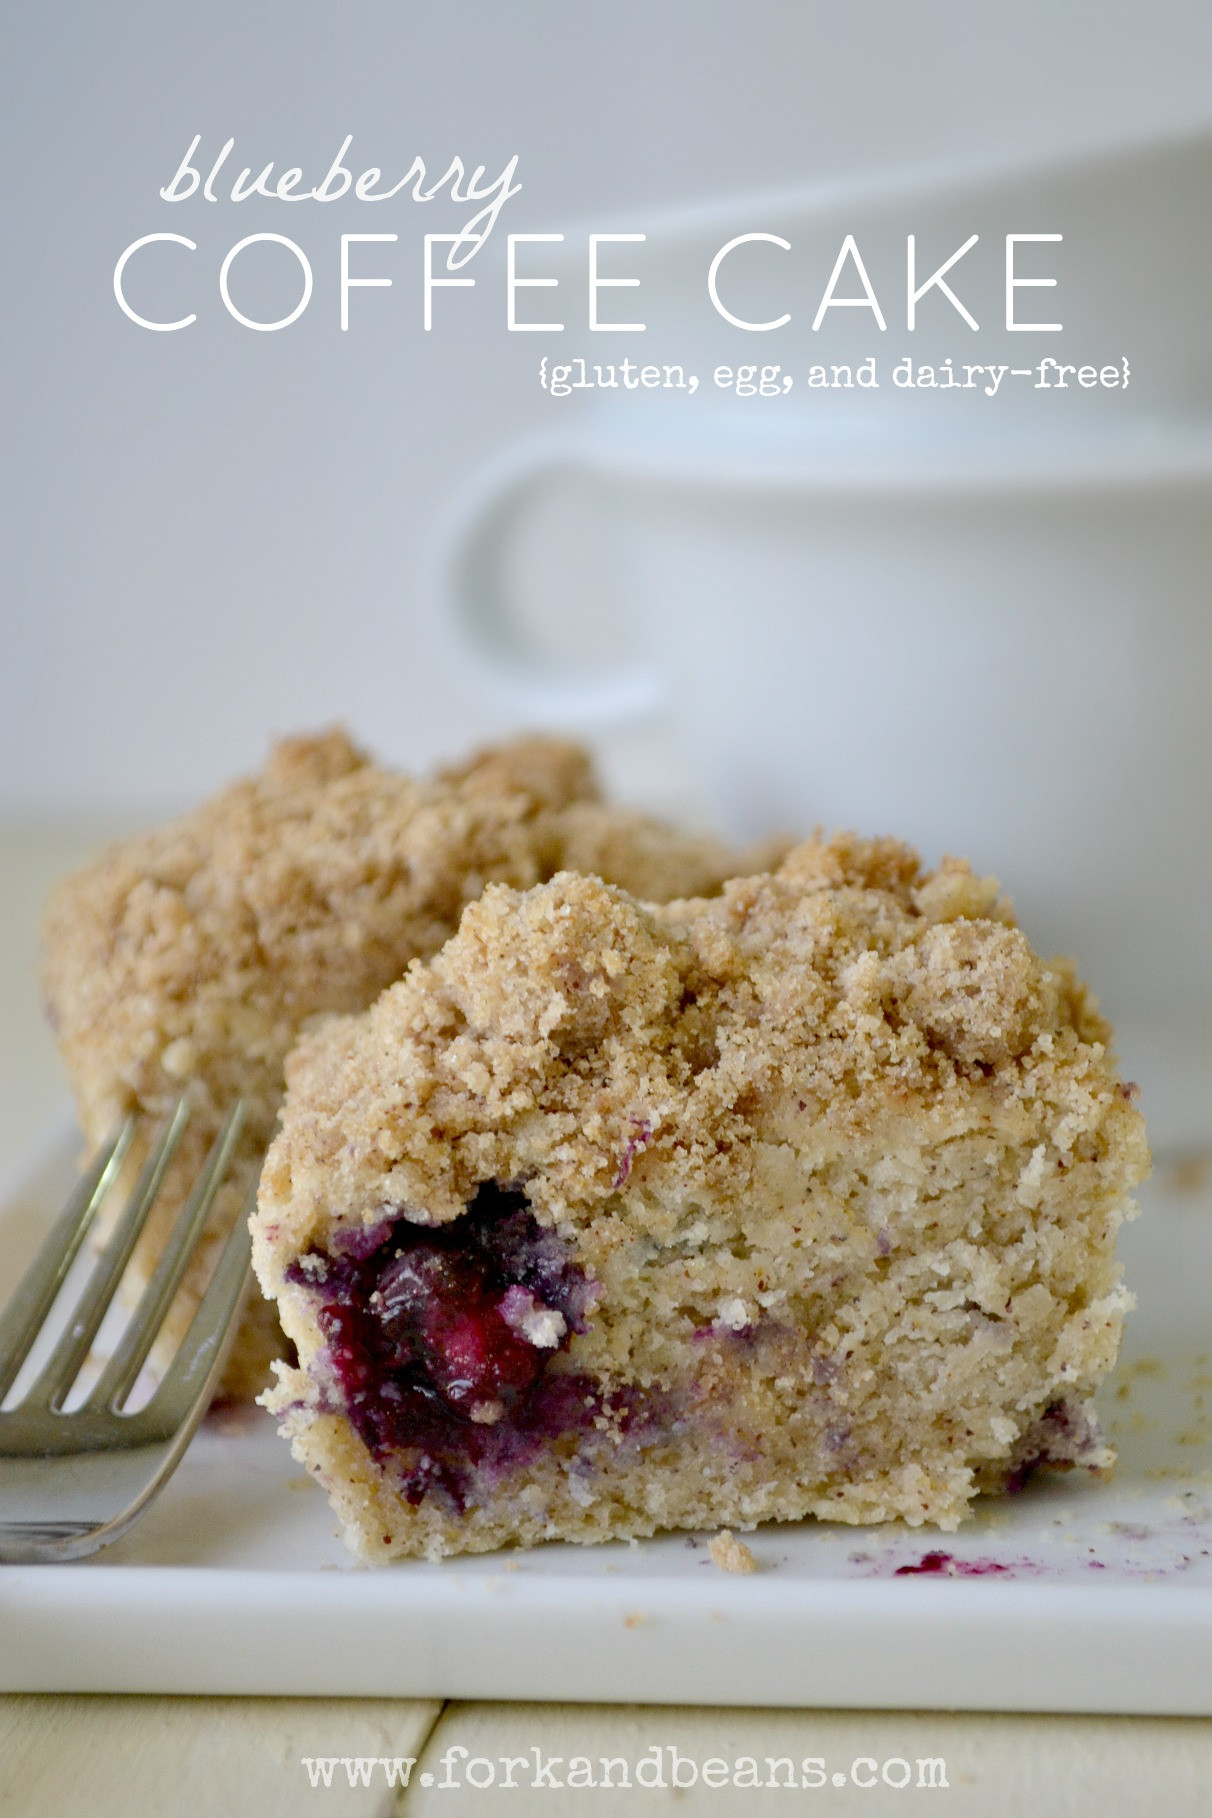 Vegan Coffee Recipes  gluten free vegan coffee cake recipe